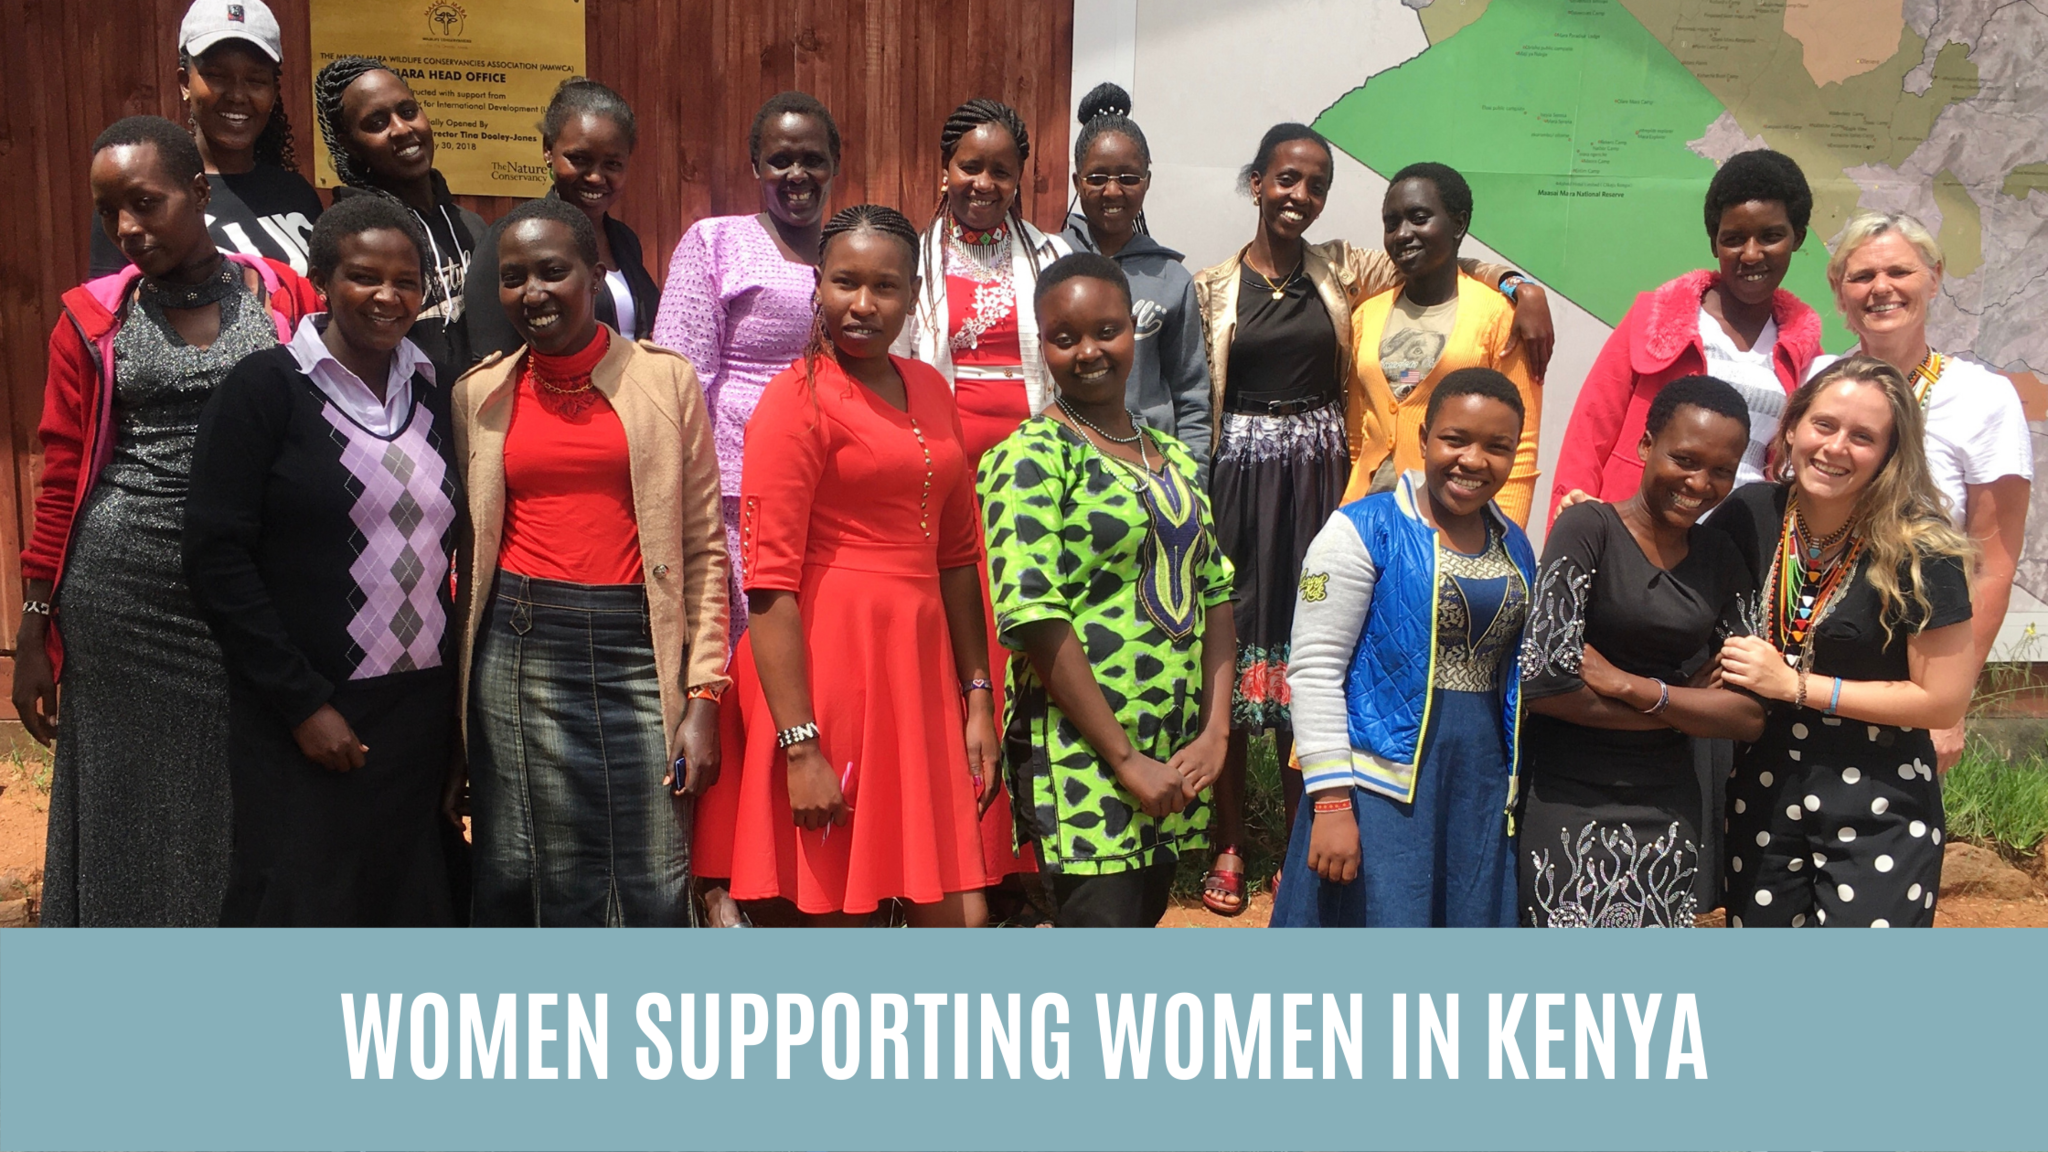 A Story of women supporting women in Kenya.